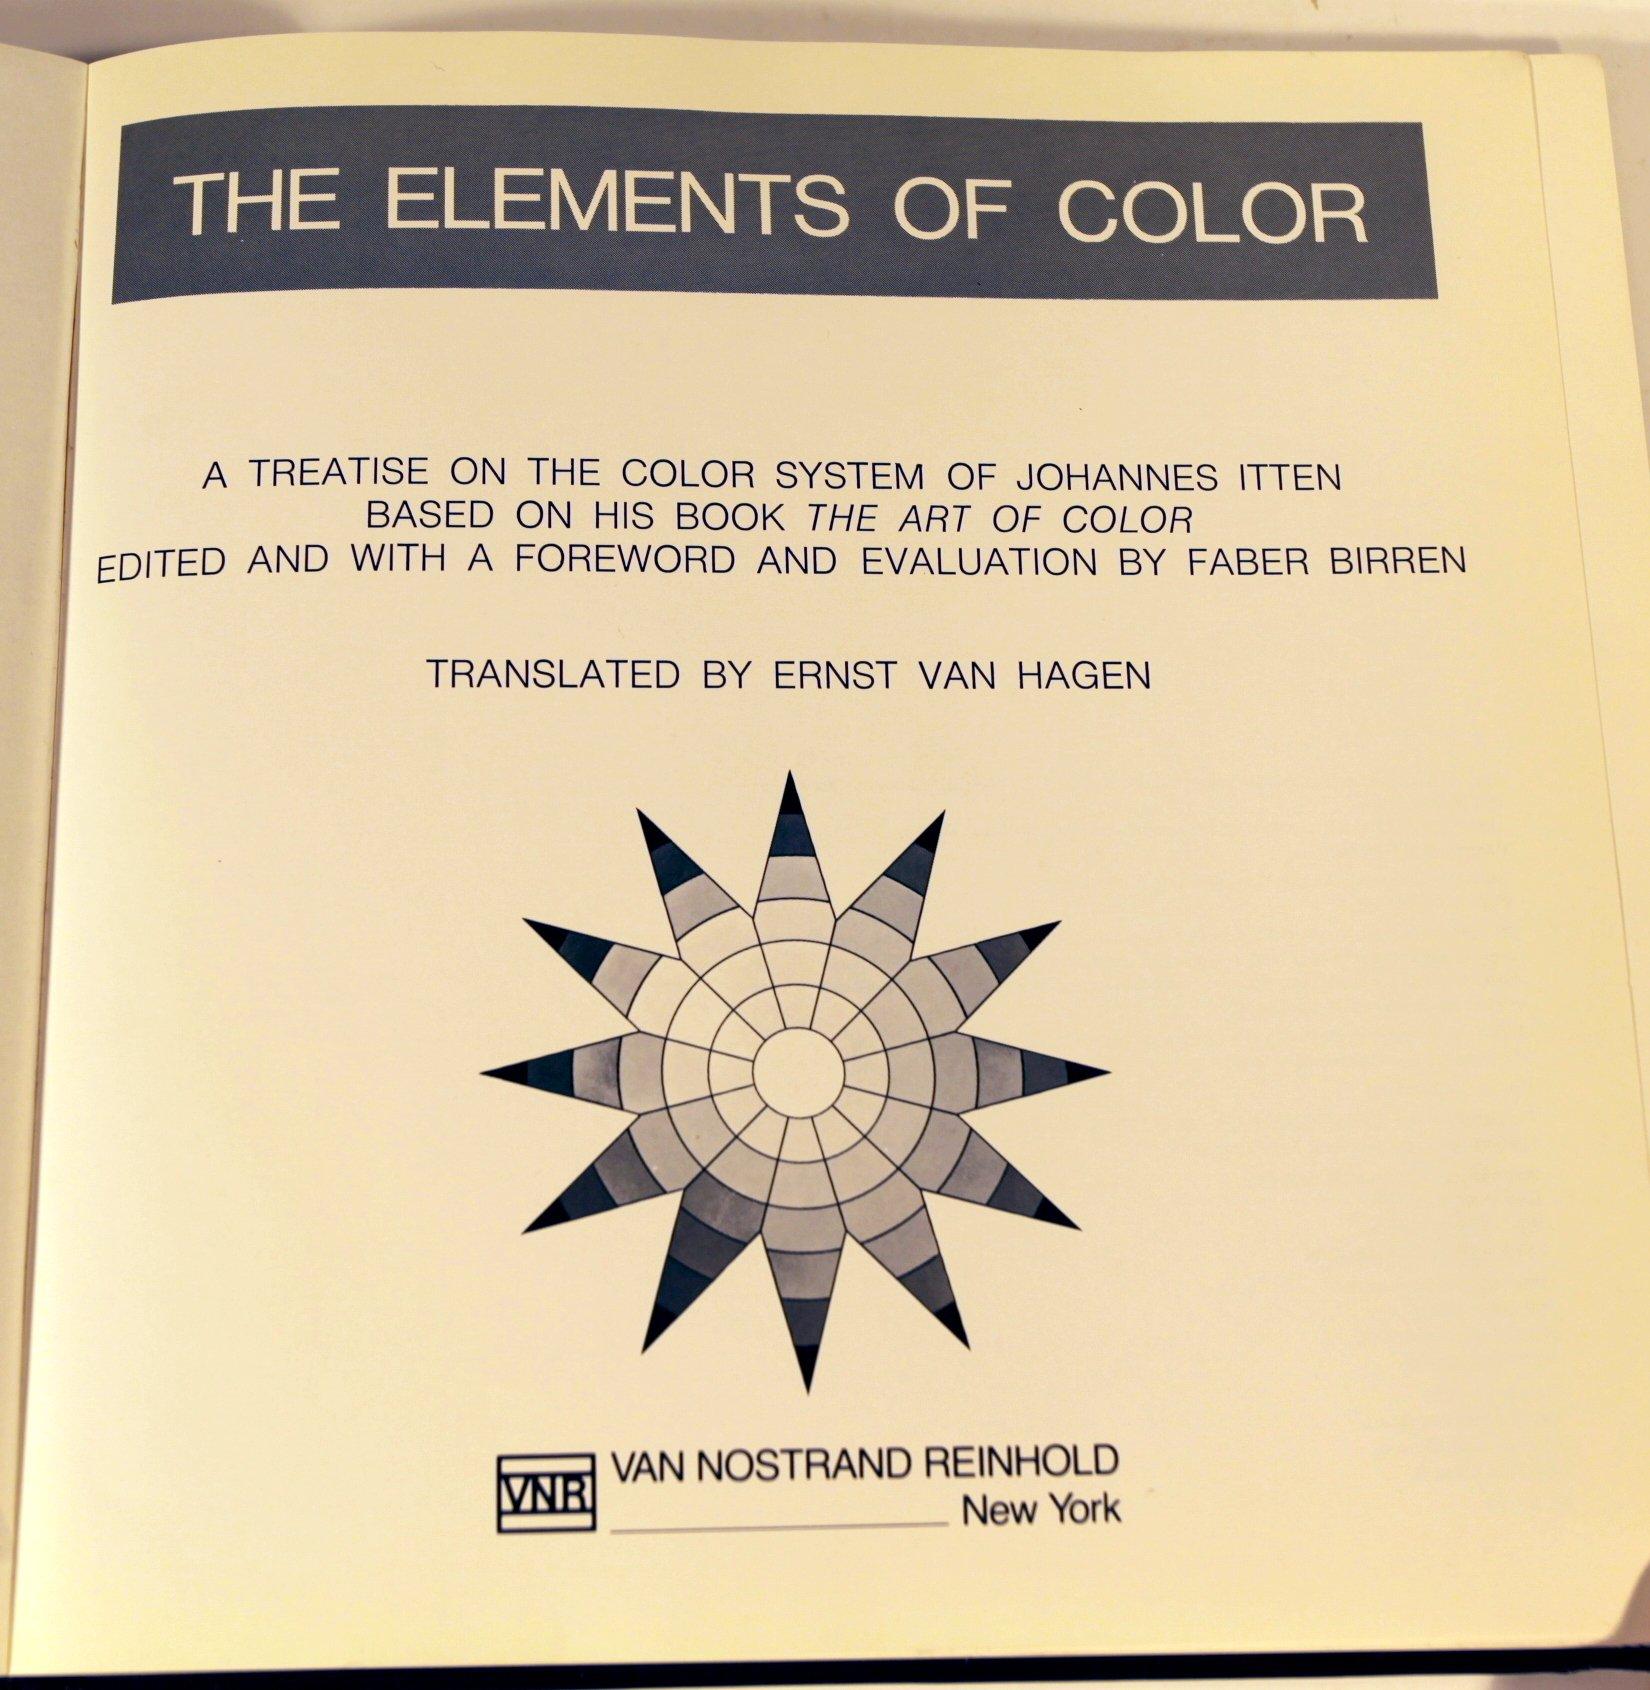 The art of color book - The Elements Of Color Amazon Co Uk Johannes Itten Faber Birren 9780442240387 Books